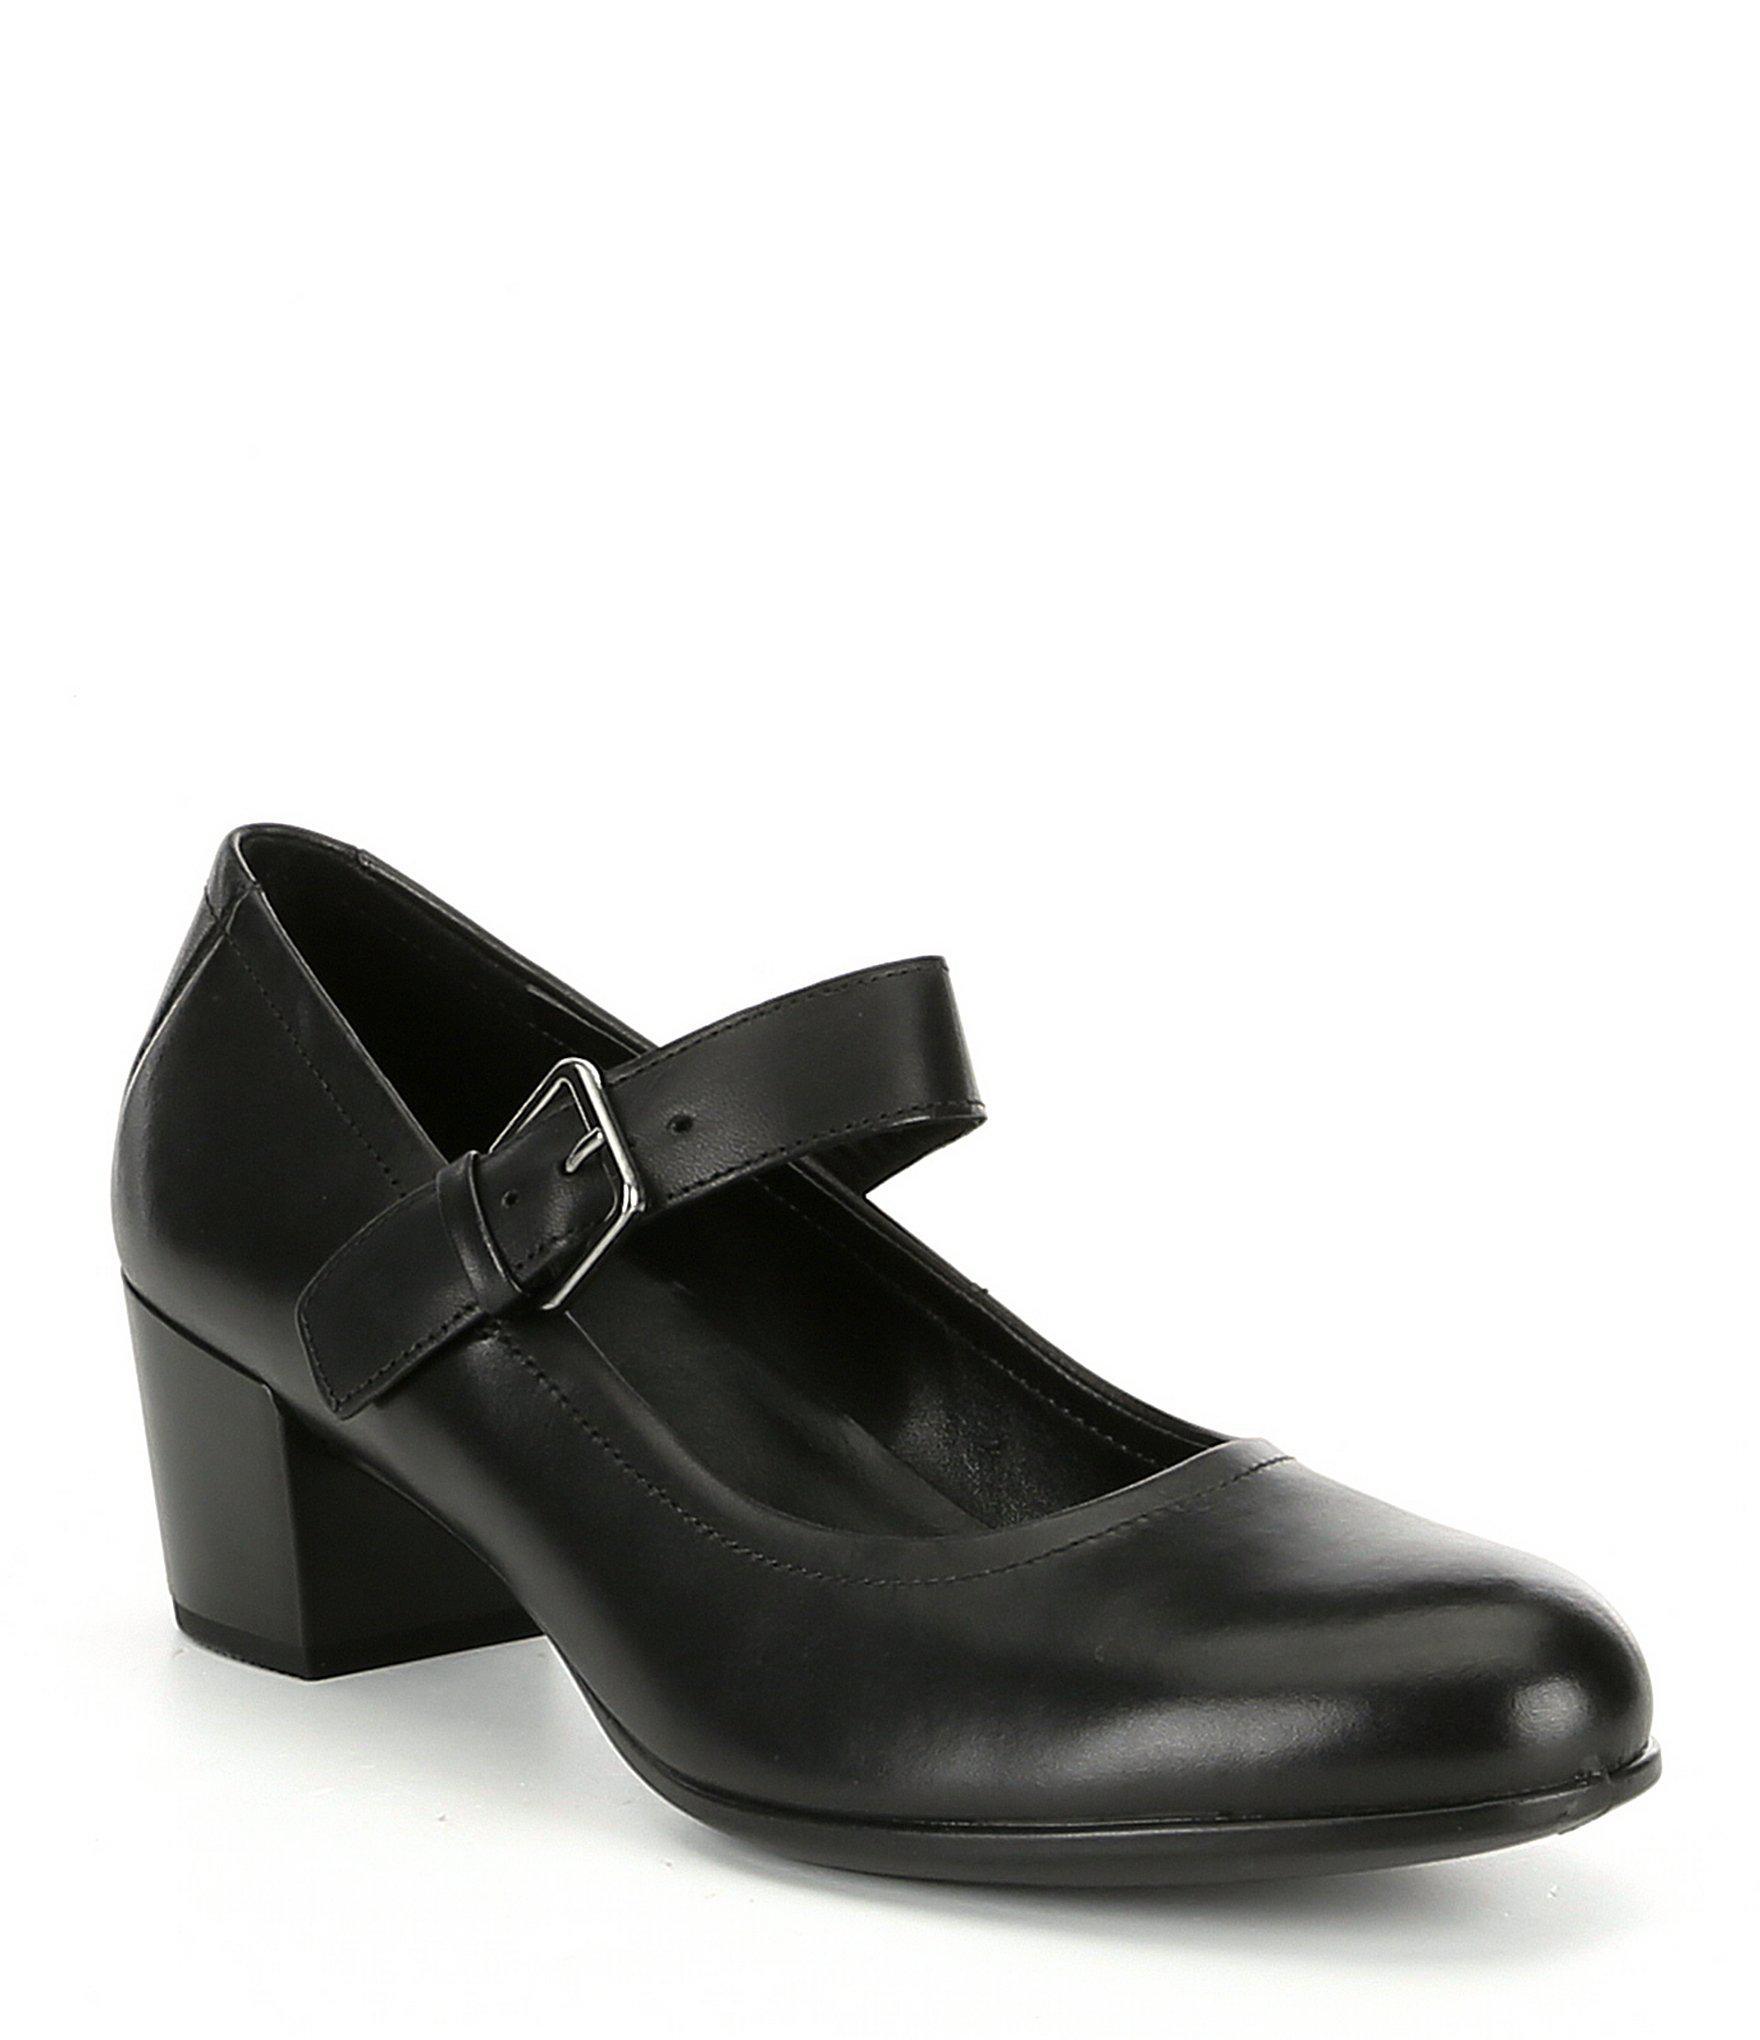 c149b3c2d6f37 Ecco. Black Shape 35 Mary Jane (dune/dune Calf Nubuck/calf Leather) Women's  Maryjane Shoes